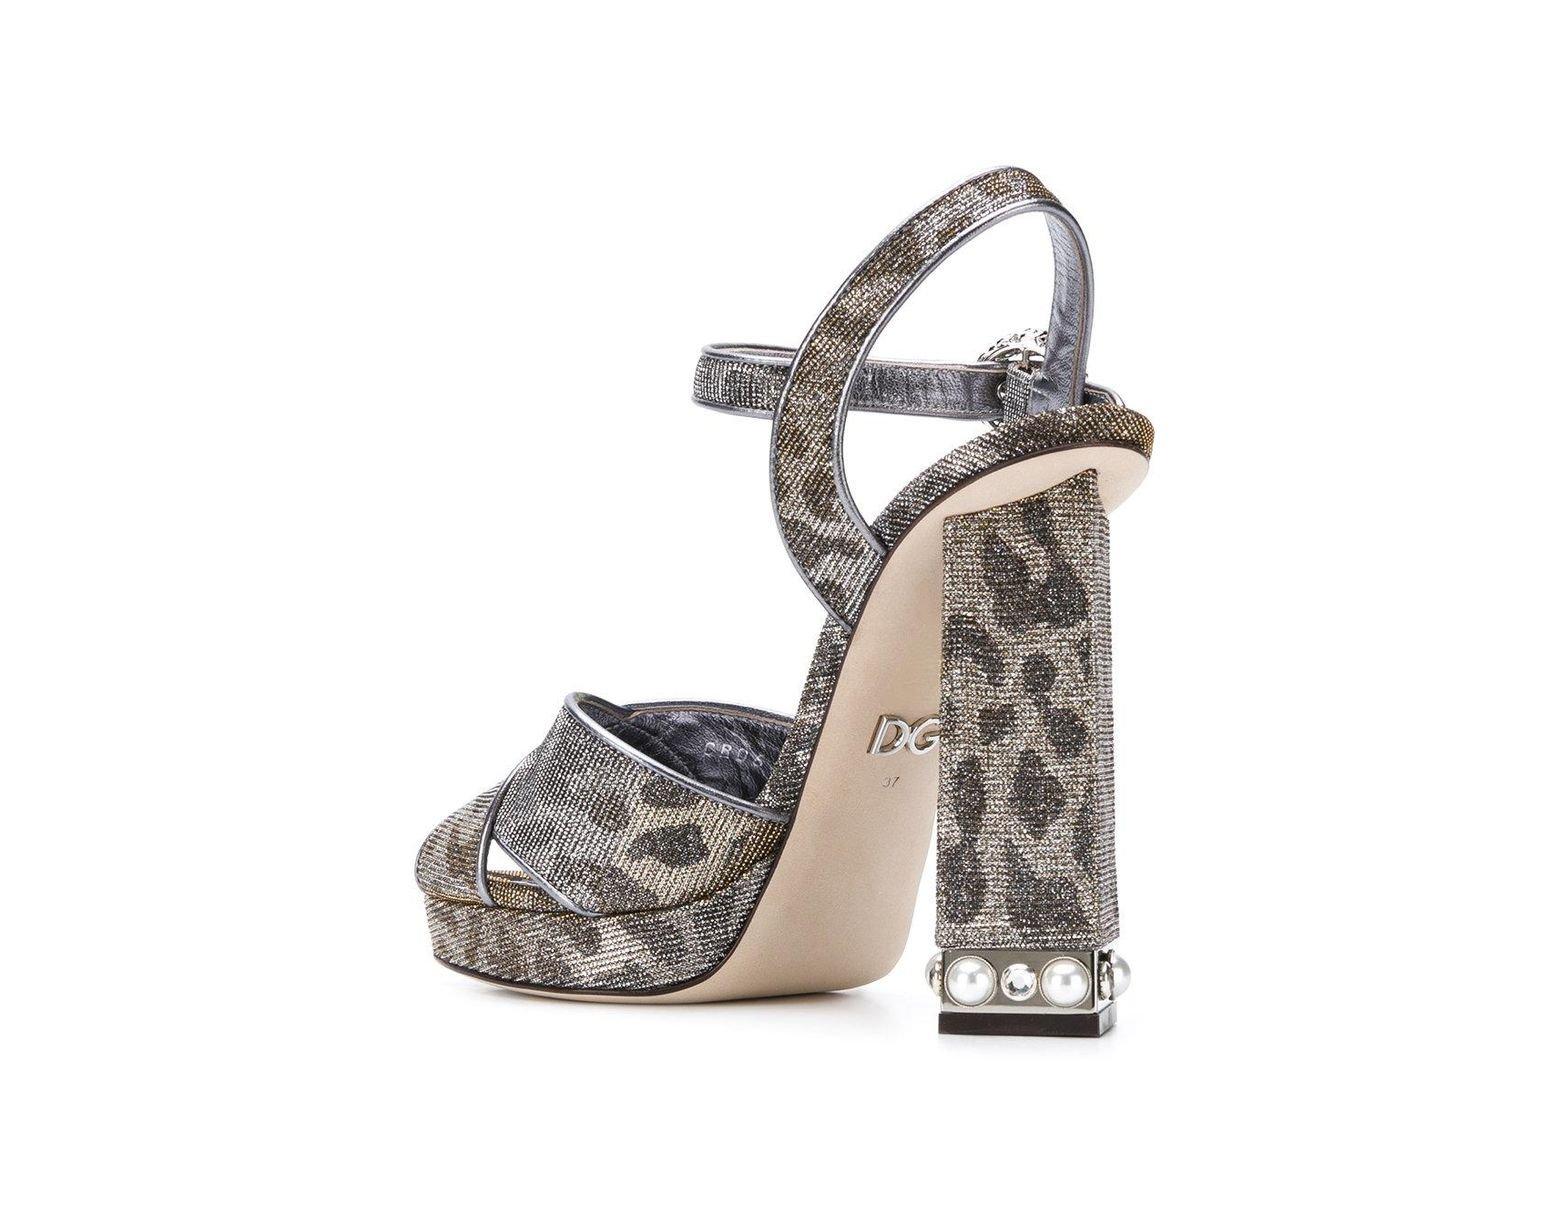 Dolceamp; Sandalias Gris De Color Gabbana Lyst Con Plataforma Joyas 1TcKJlF